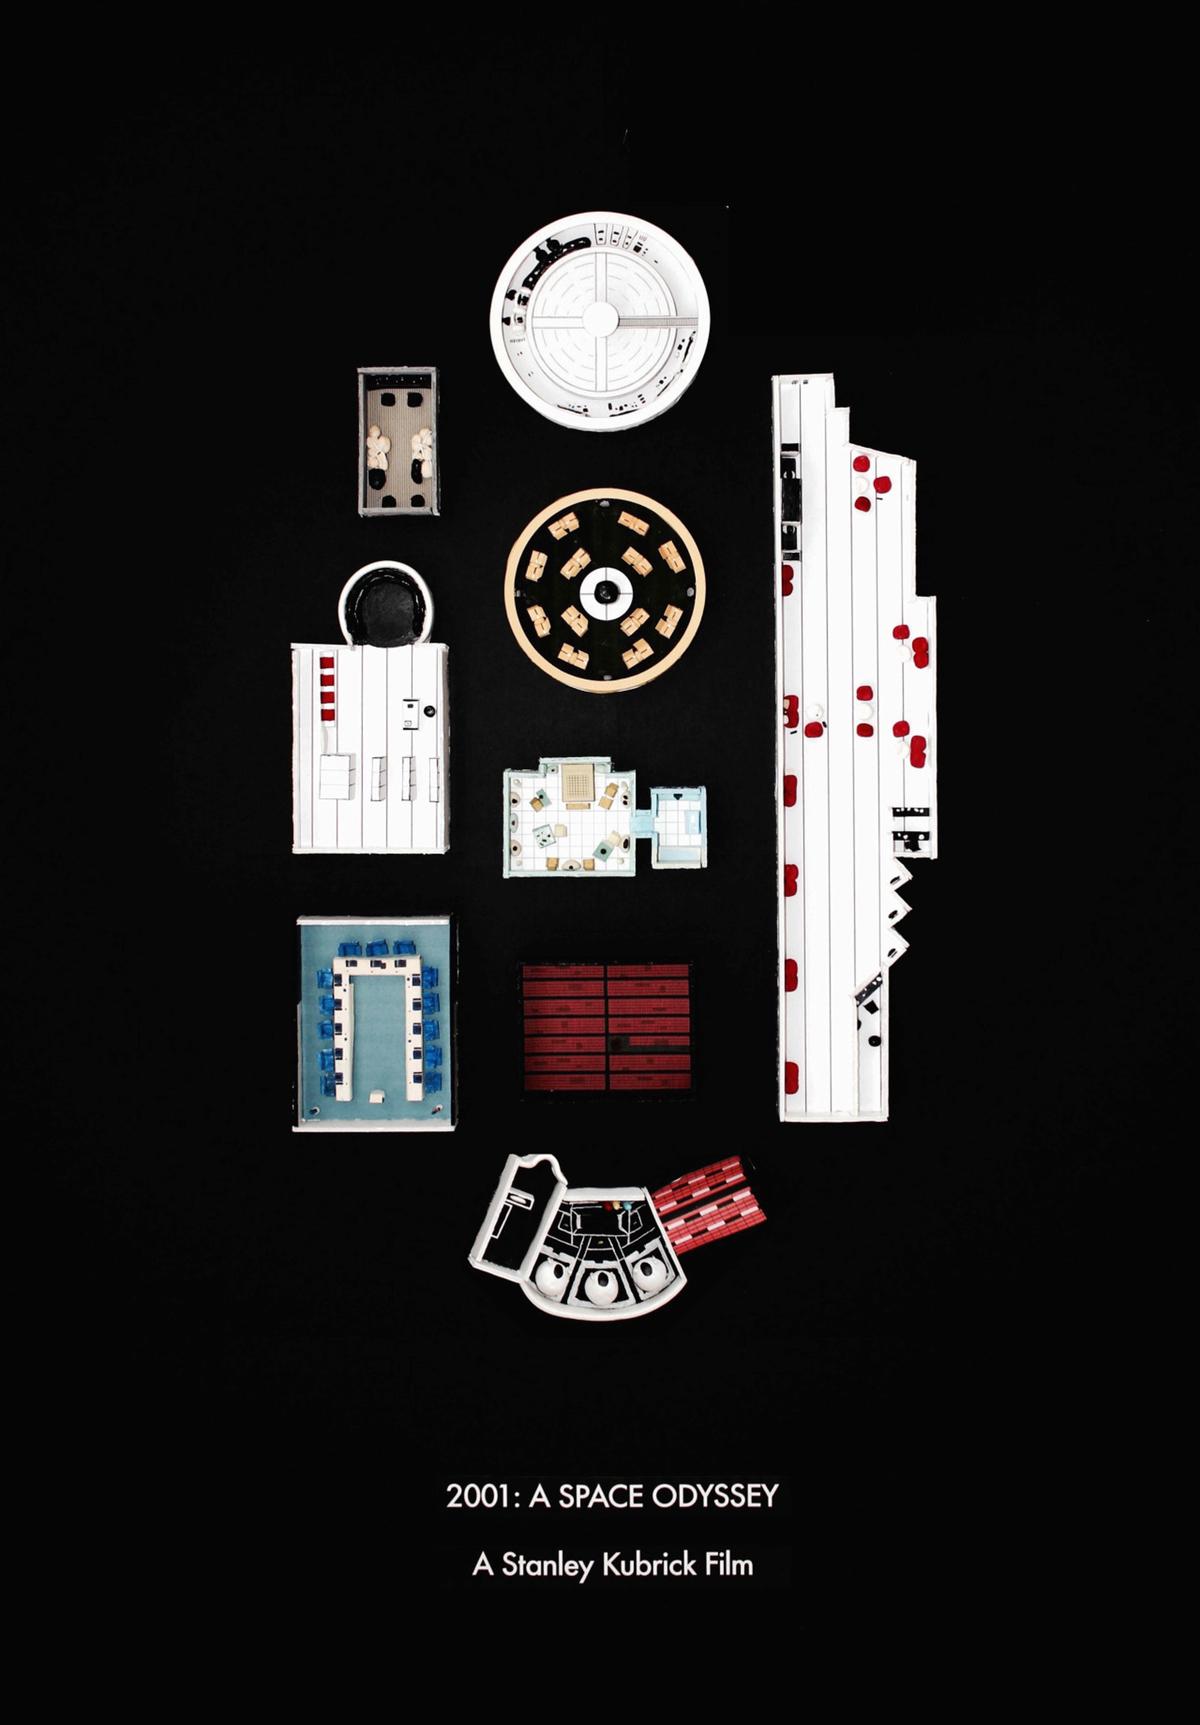 Jordan Bolton - 2001: A Space Odyssey